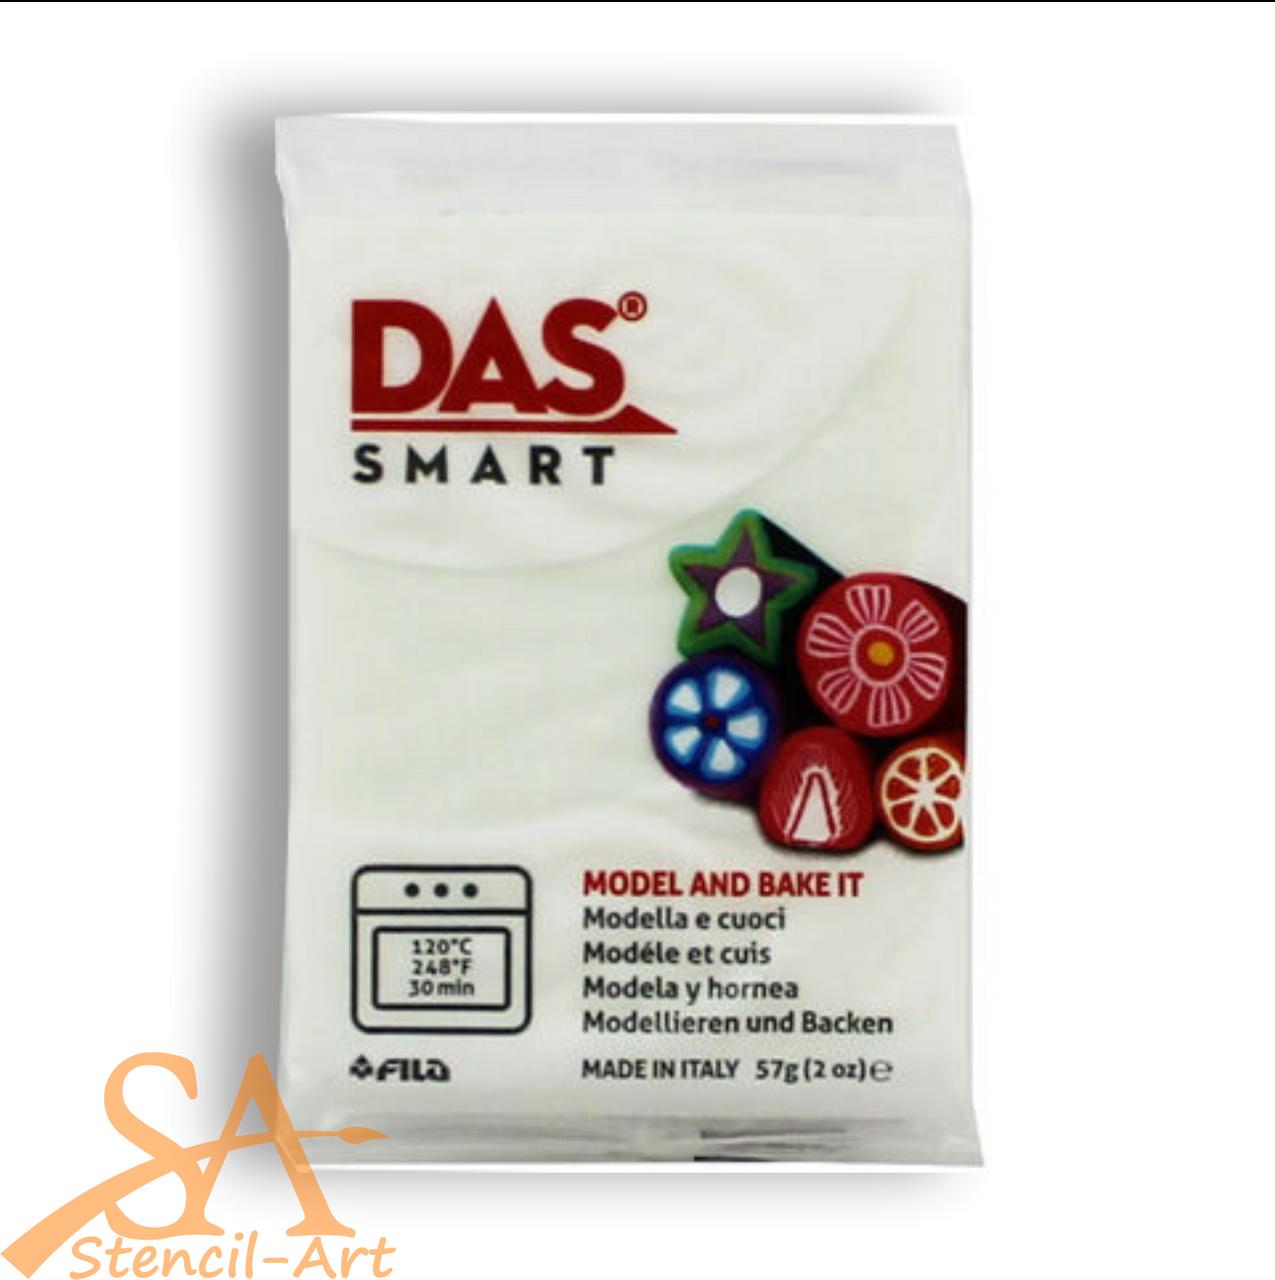 DAS Smart 57g – Opal White #321601